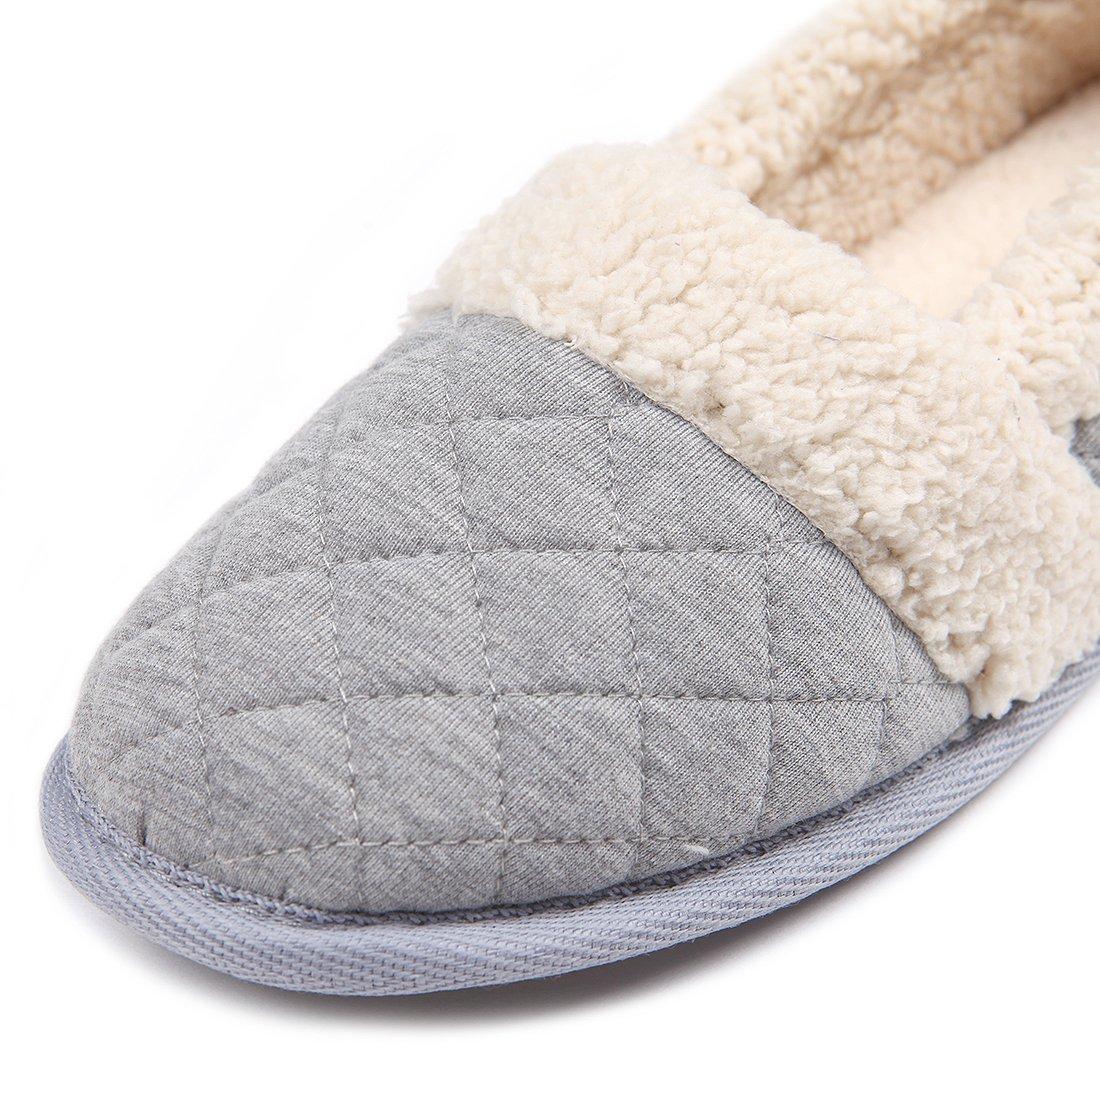 24b794f327c8 ChicNChic Women Plush House Slippers Ladies Non Slip Indoor Winter Bedroom  Shoes (9-10 B(M) US